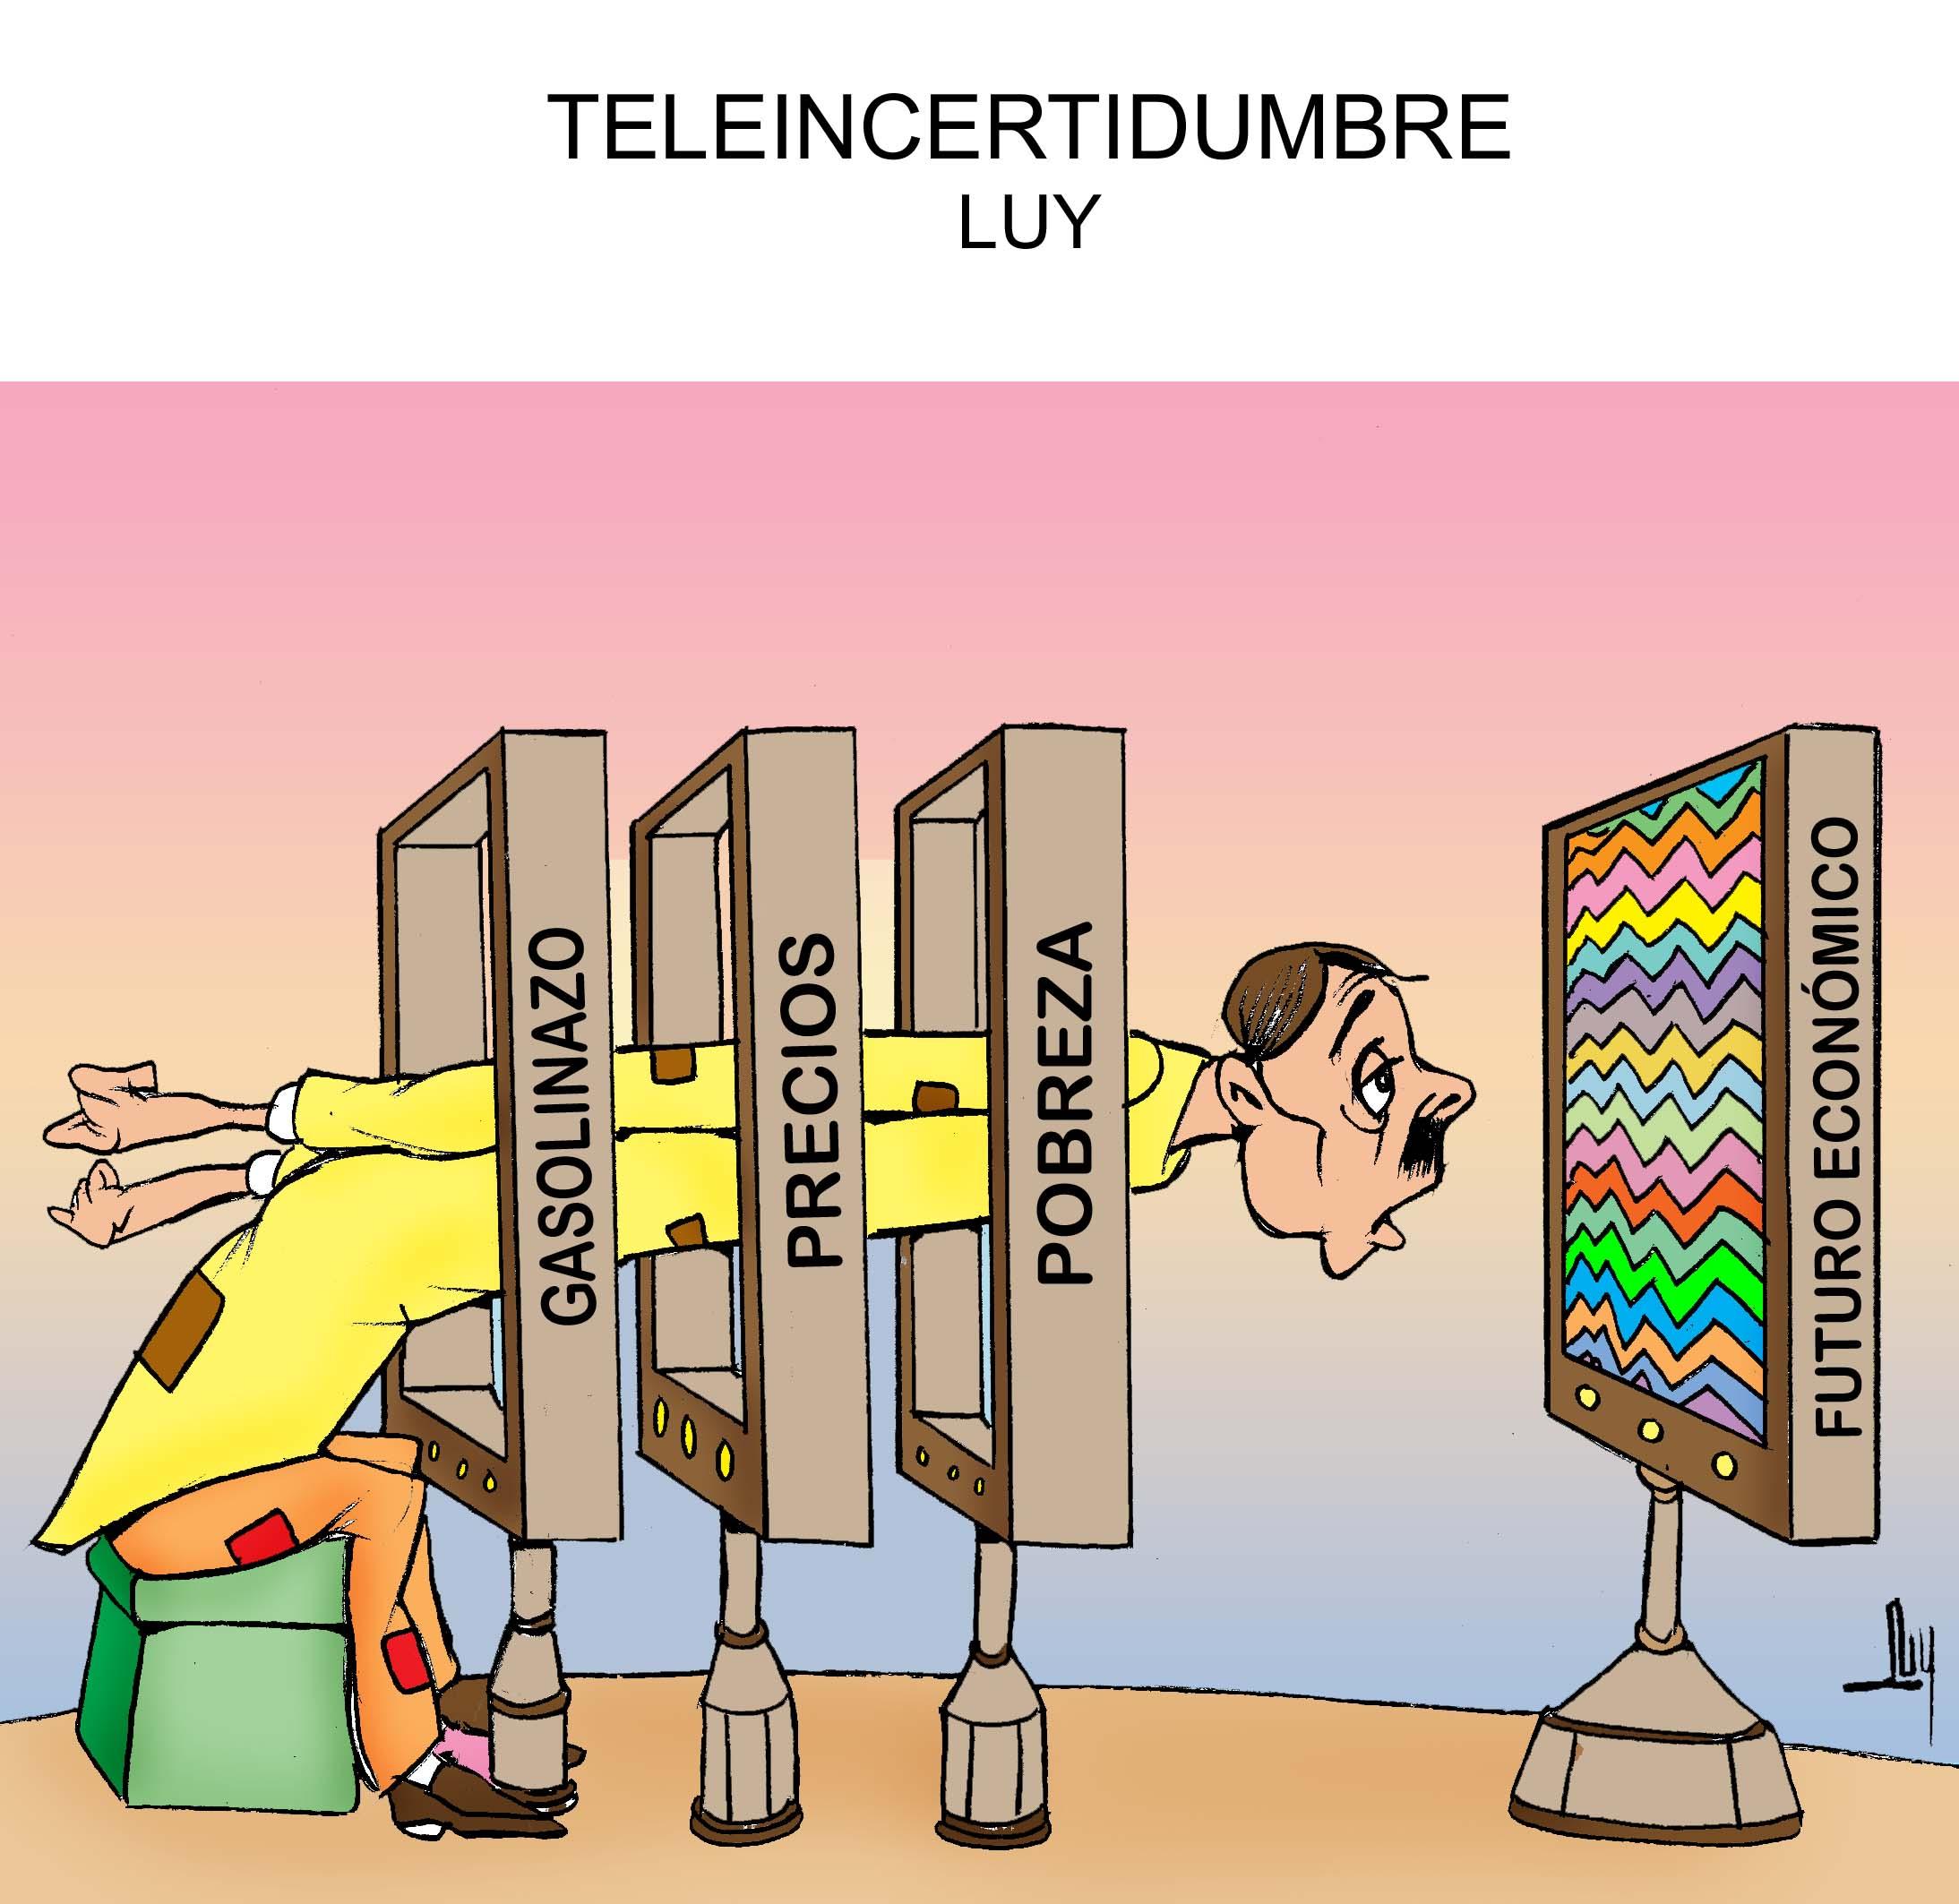 teleincertidumbre